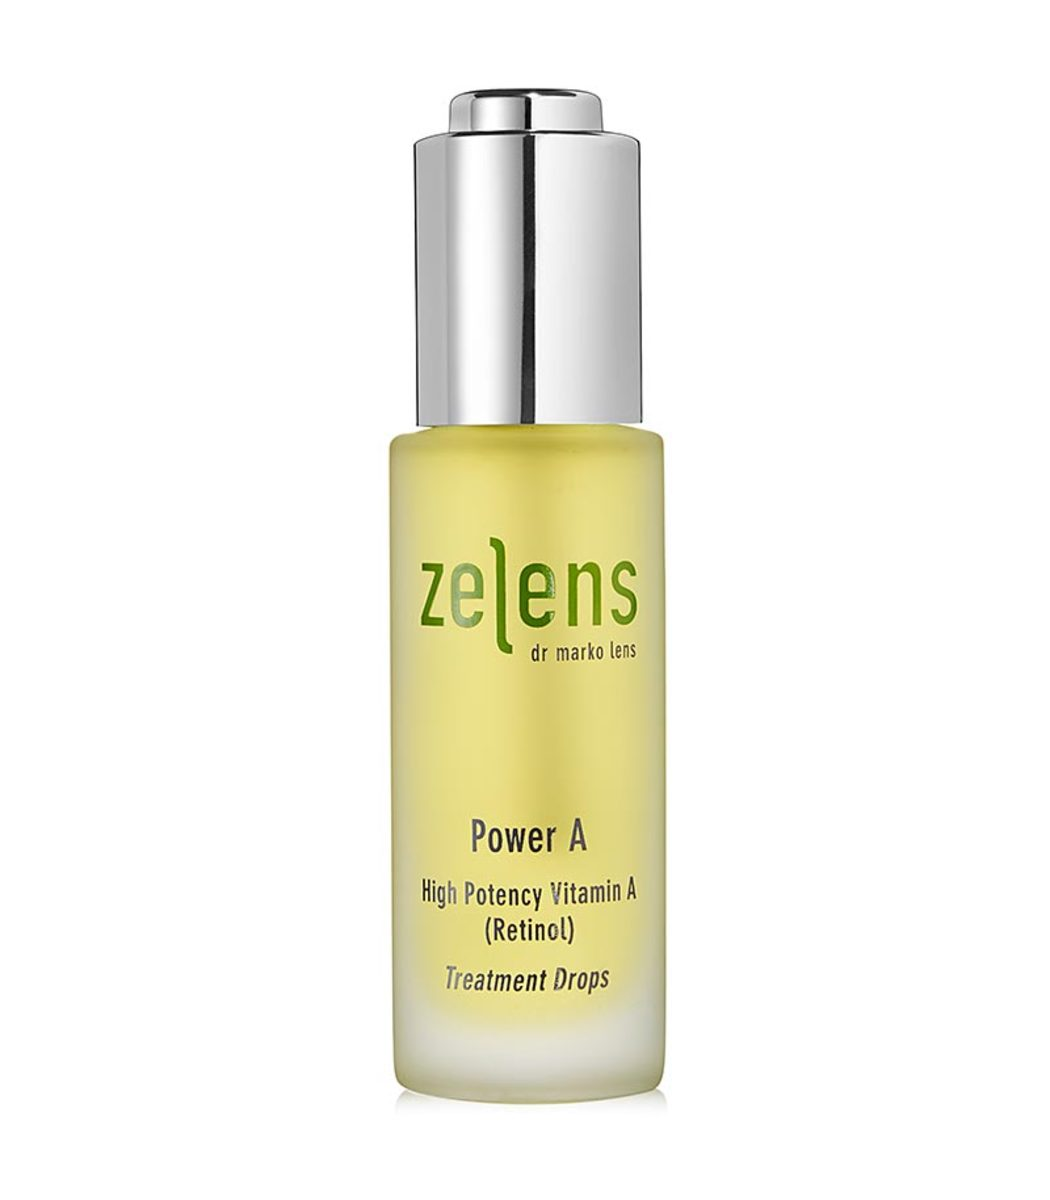 ZELENS Power A High Potency Vitamin A Treatment Drops